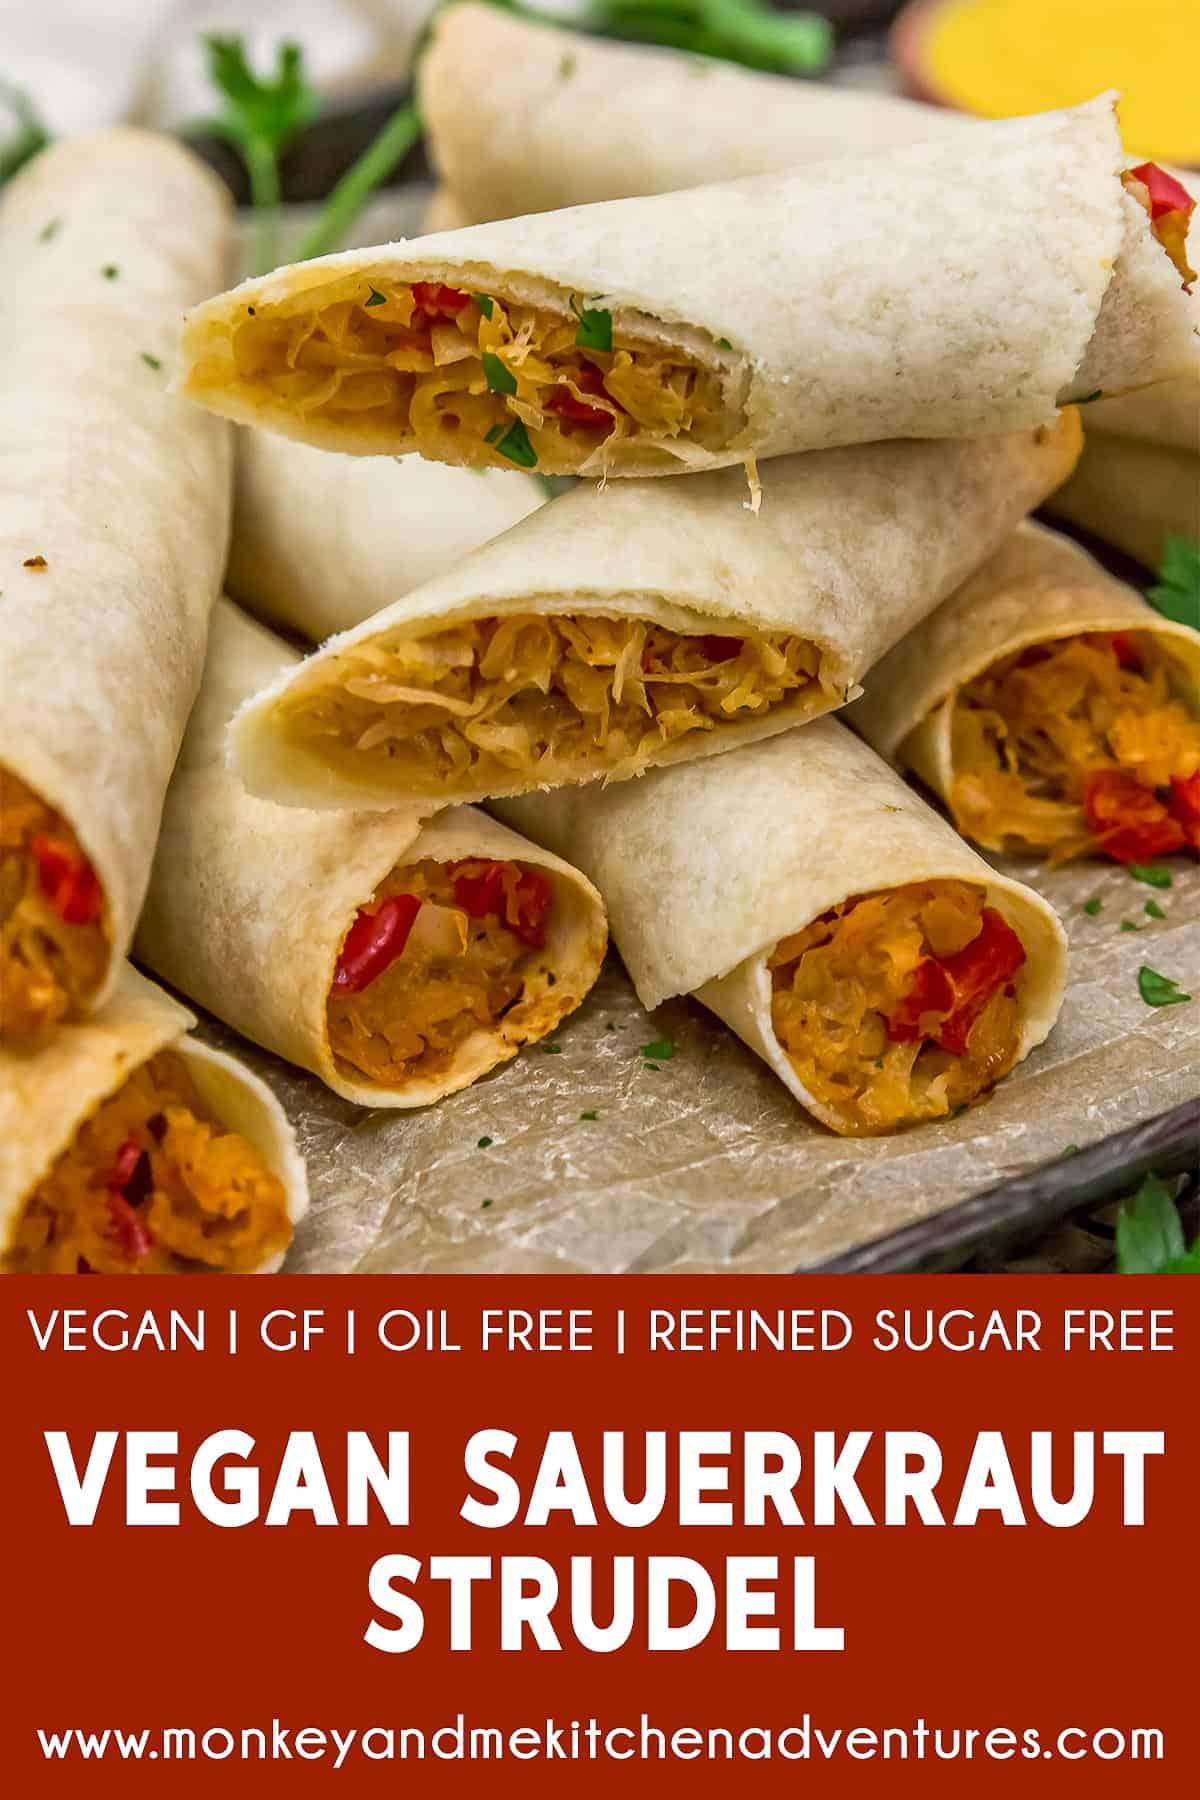 Vegan Sauerkraut Strudel (Krautstrudel) with text description